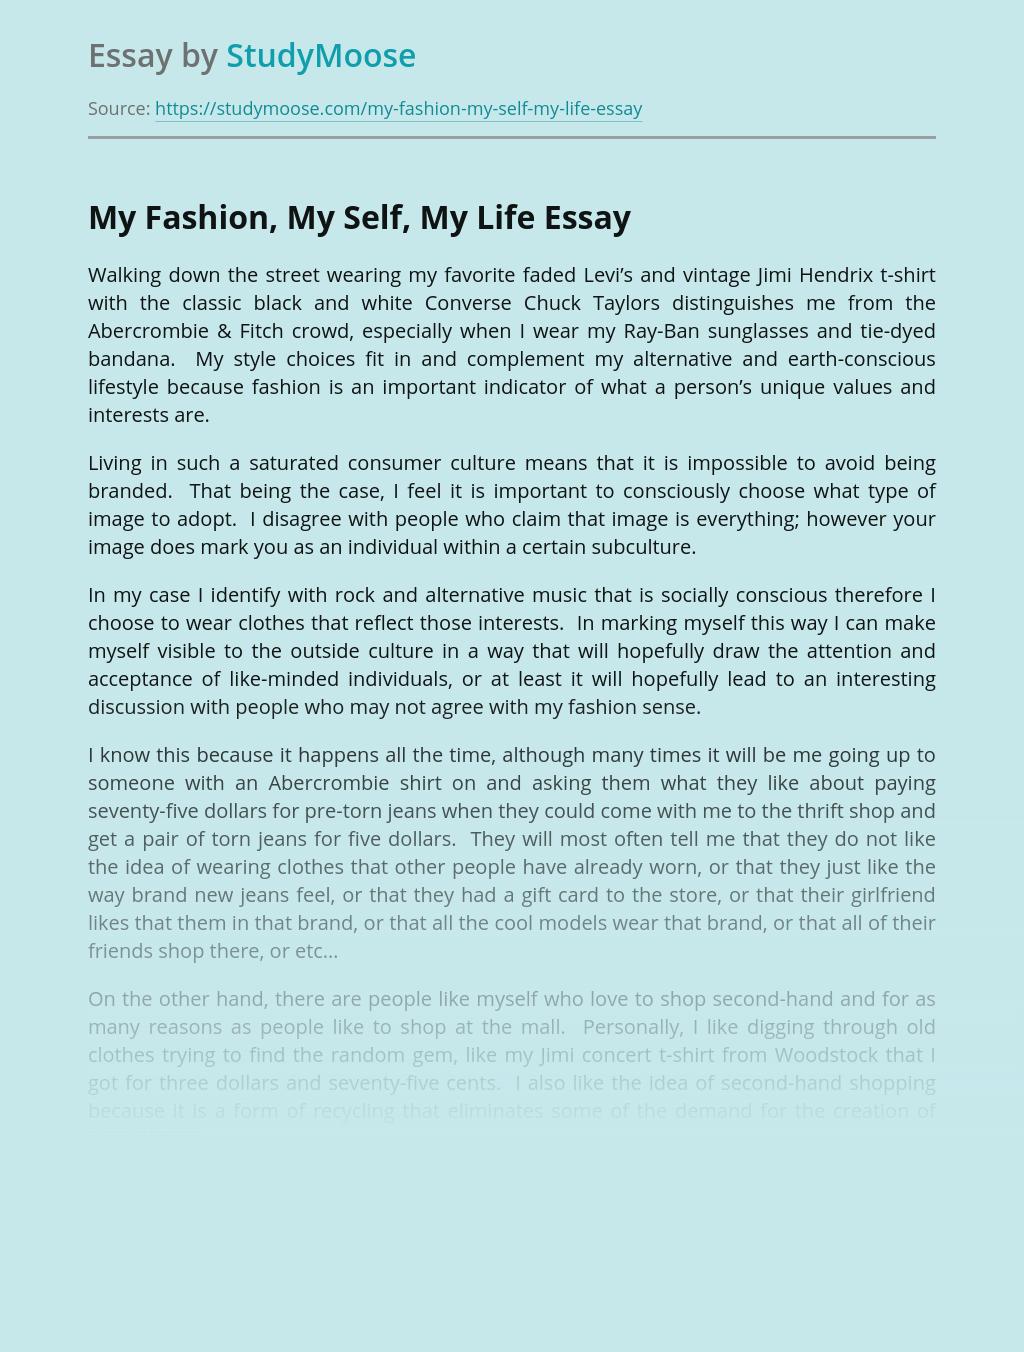 My Fashion, My Self, My Life